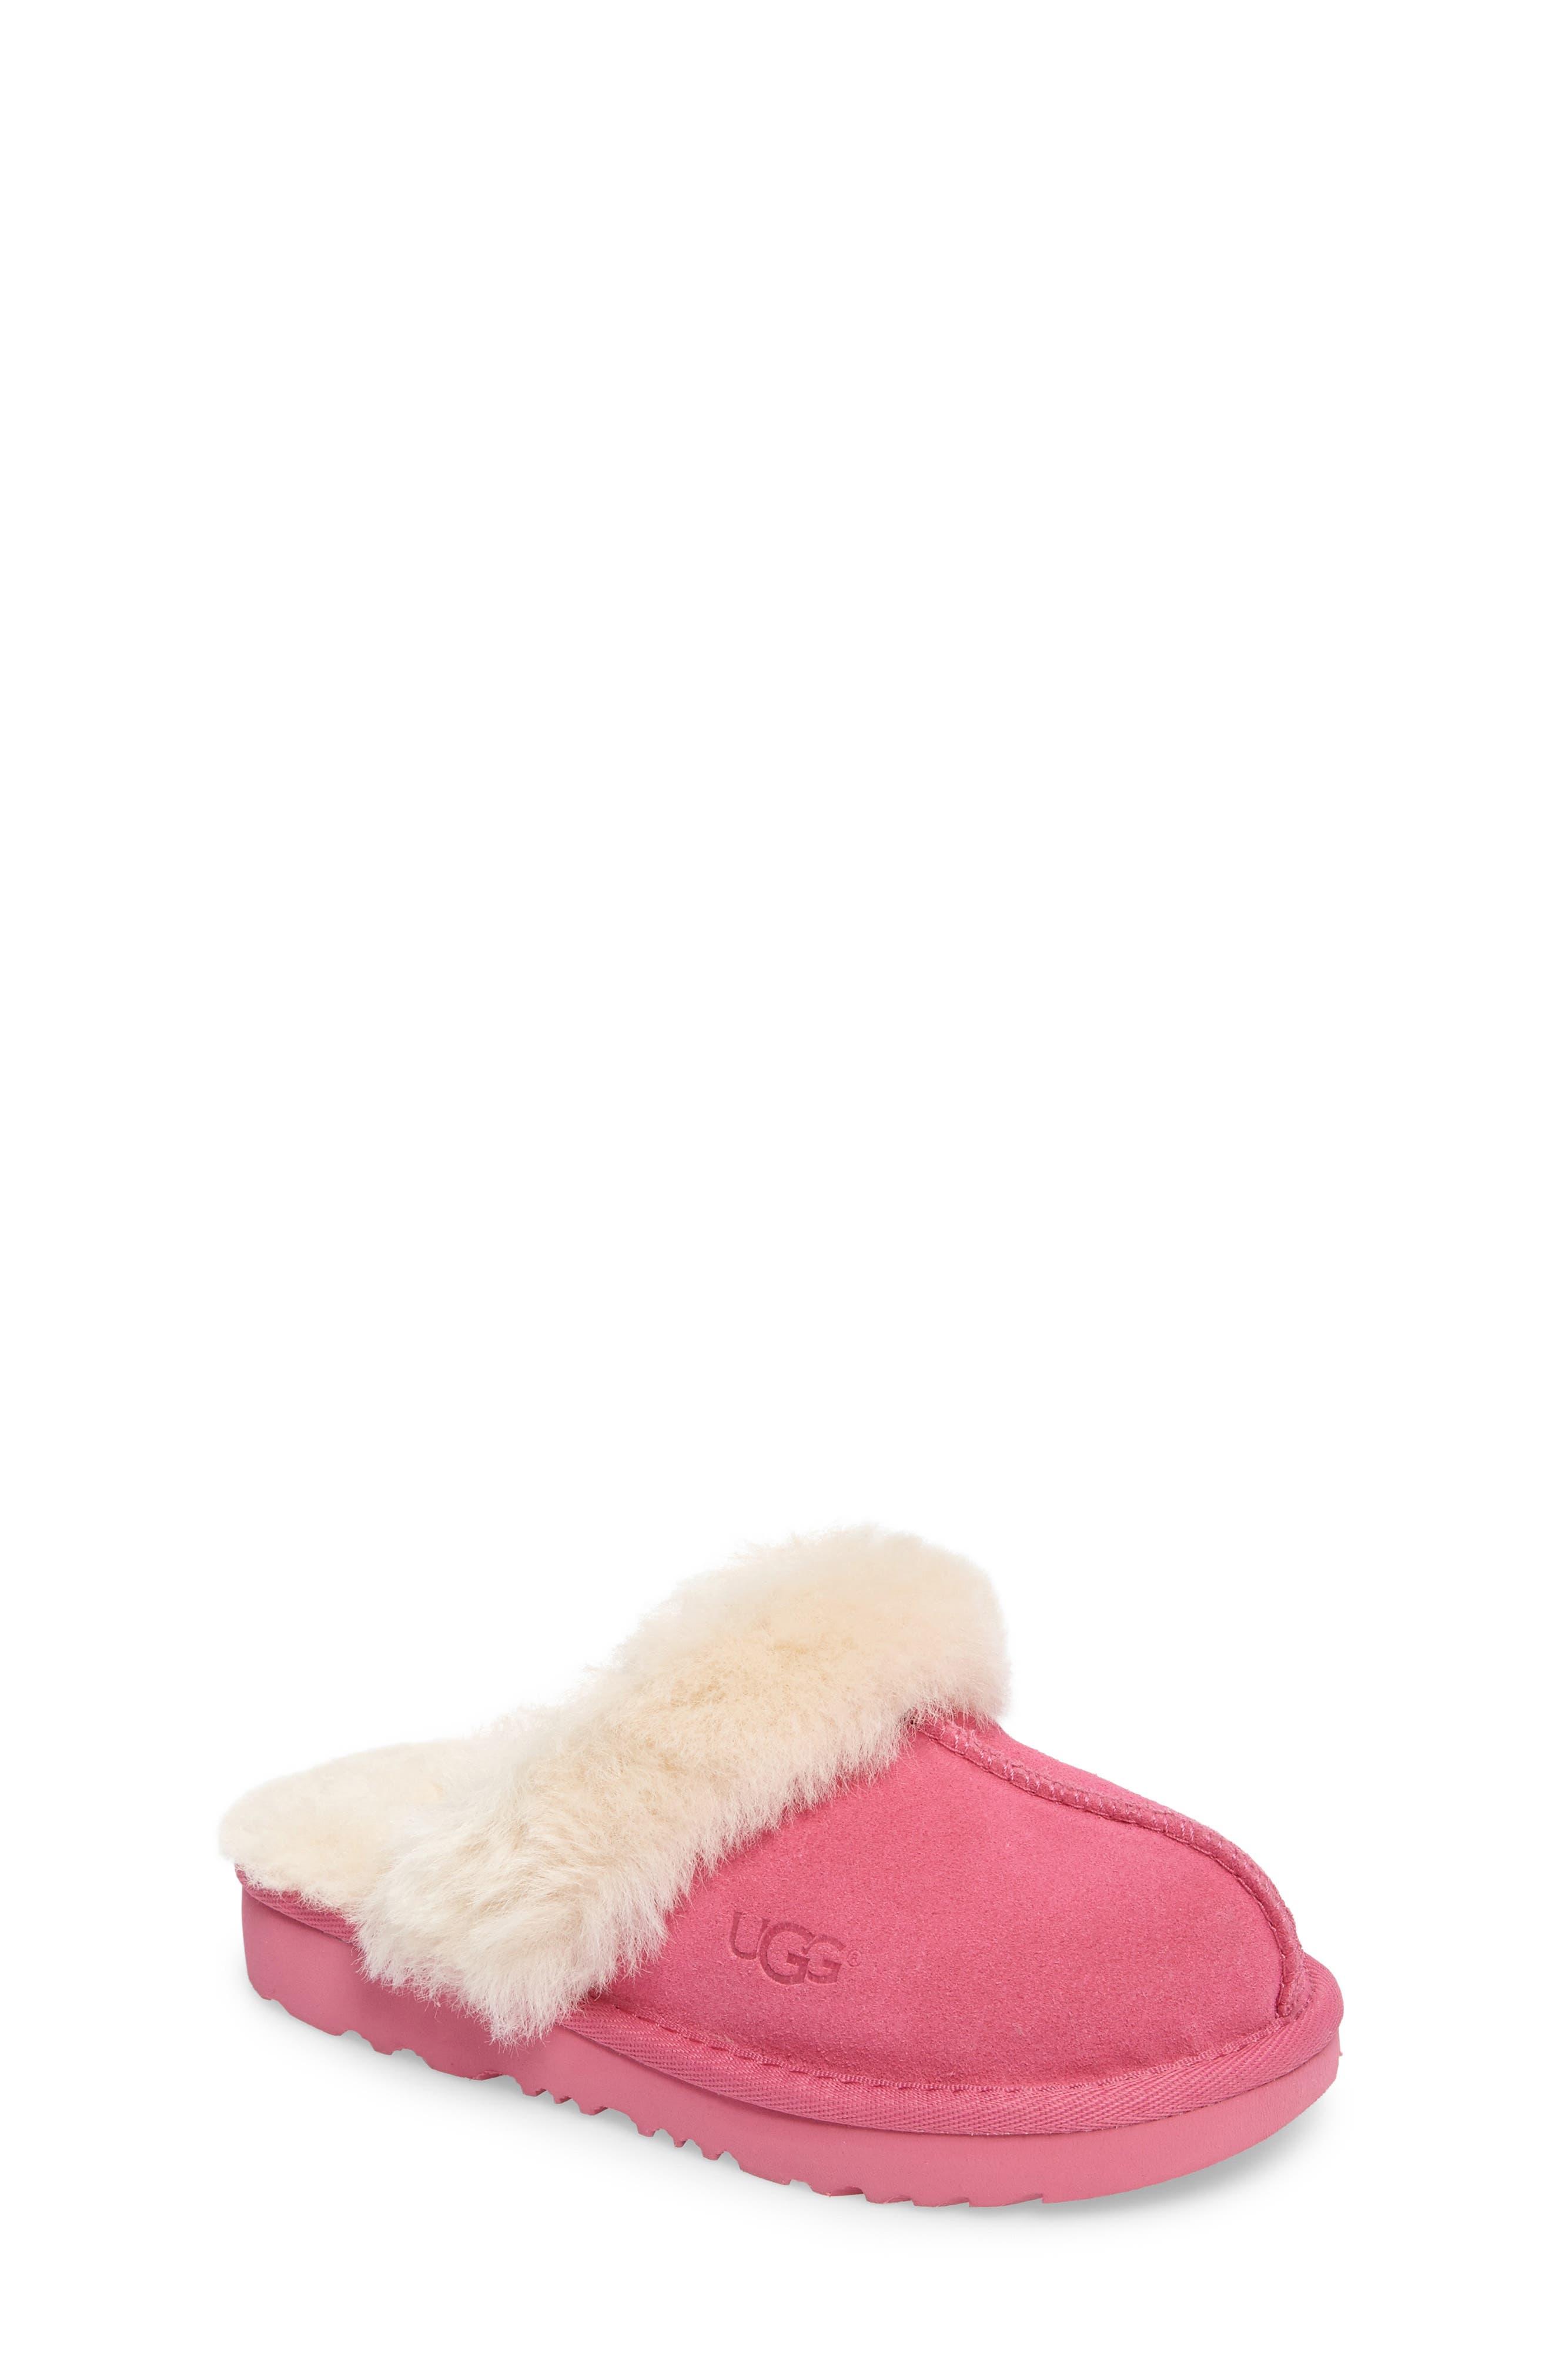 buy \u003e pink ugg slippers kids \u003e Up to 75